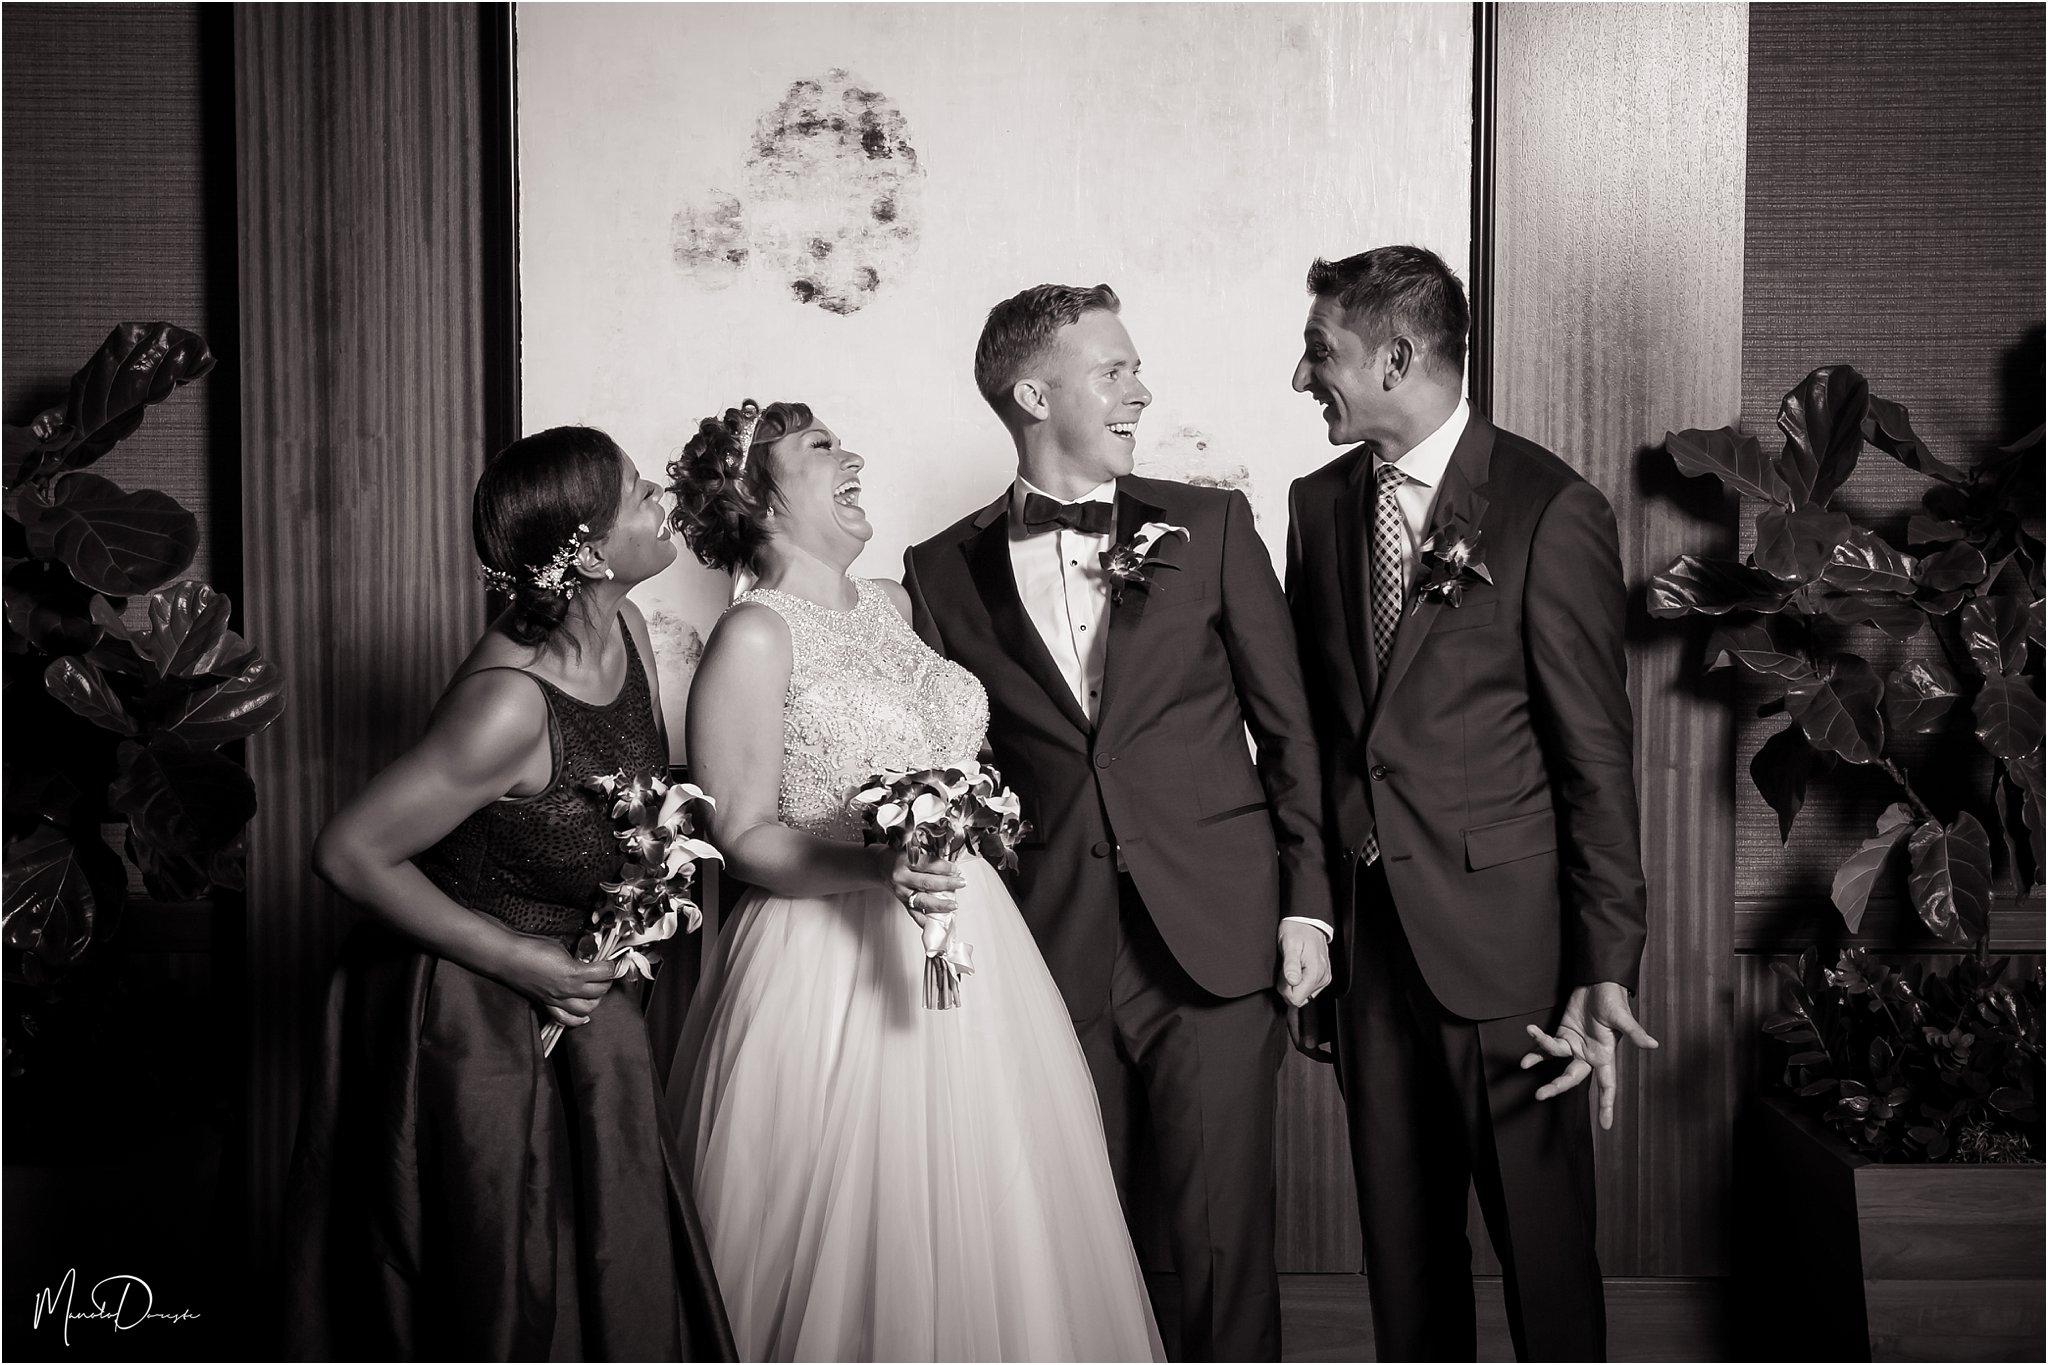 0454_ManoloDoreste_InFocusStudios_Wedding_Family_Photography_Miami_MiamiPhotographer.jpg